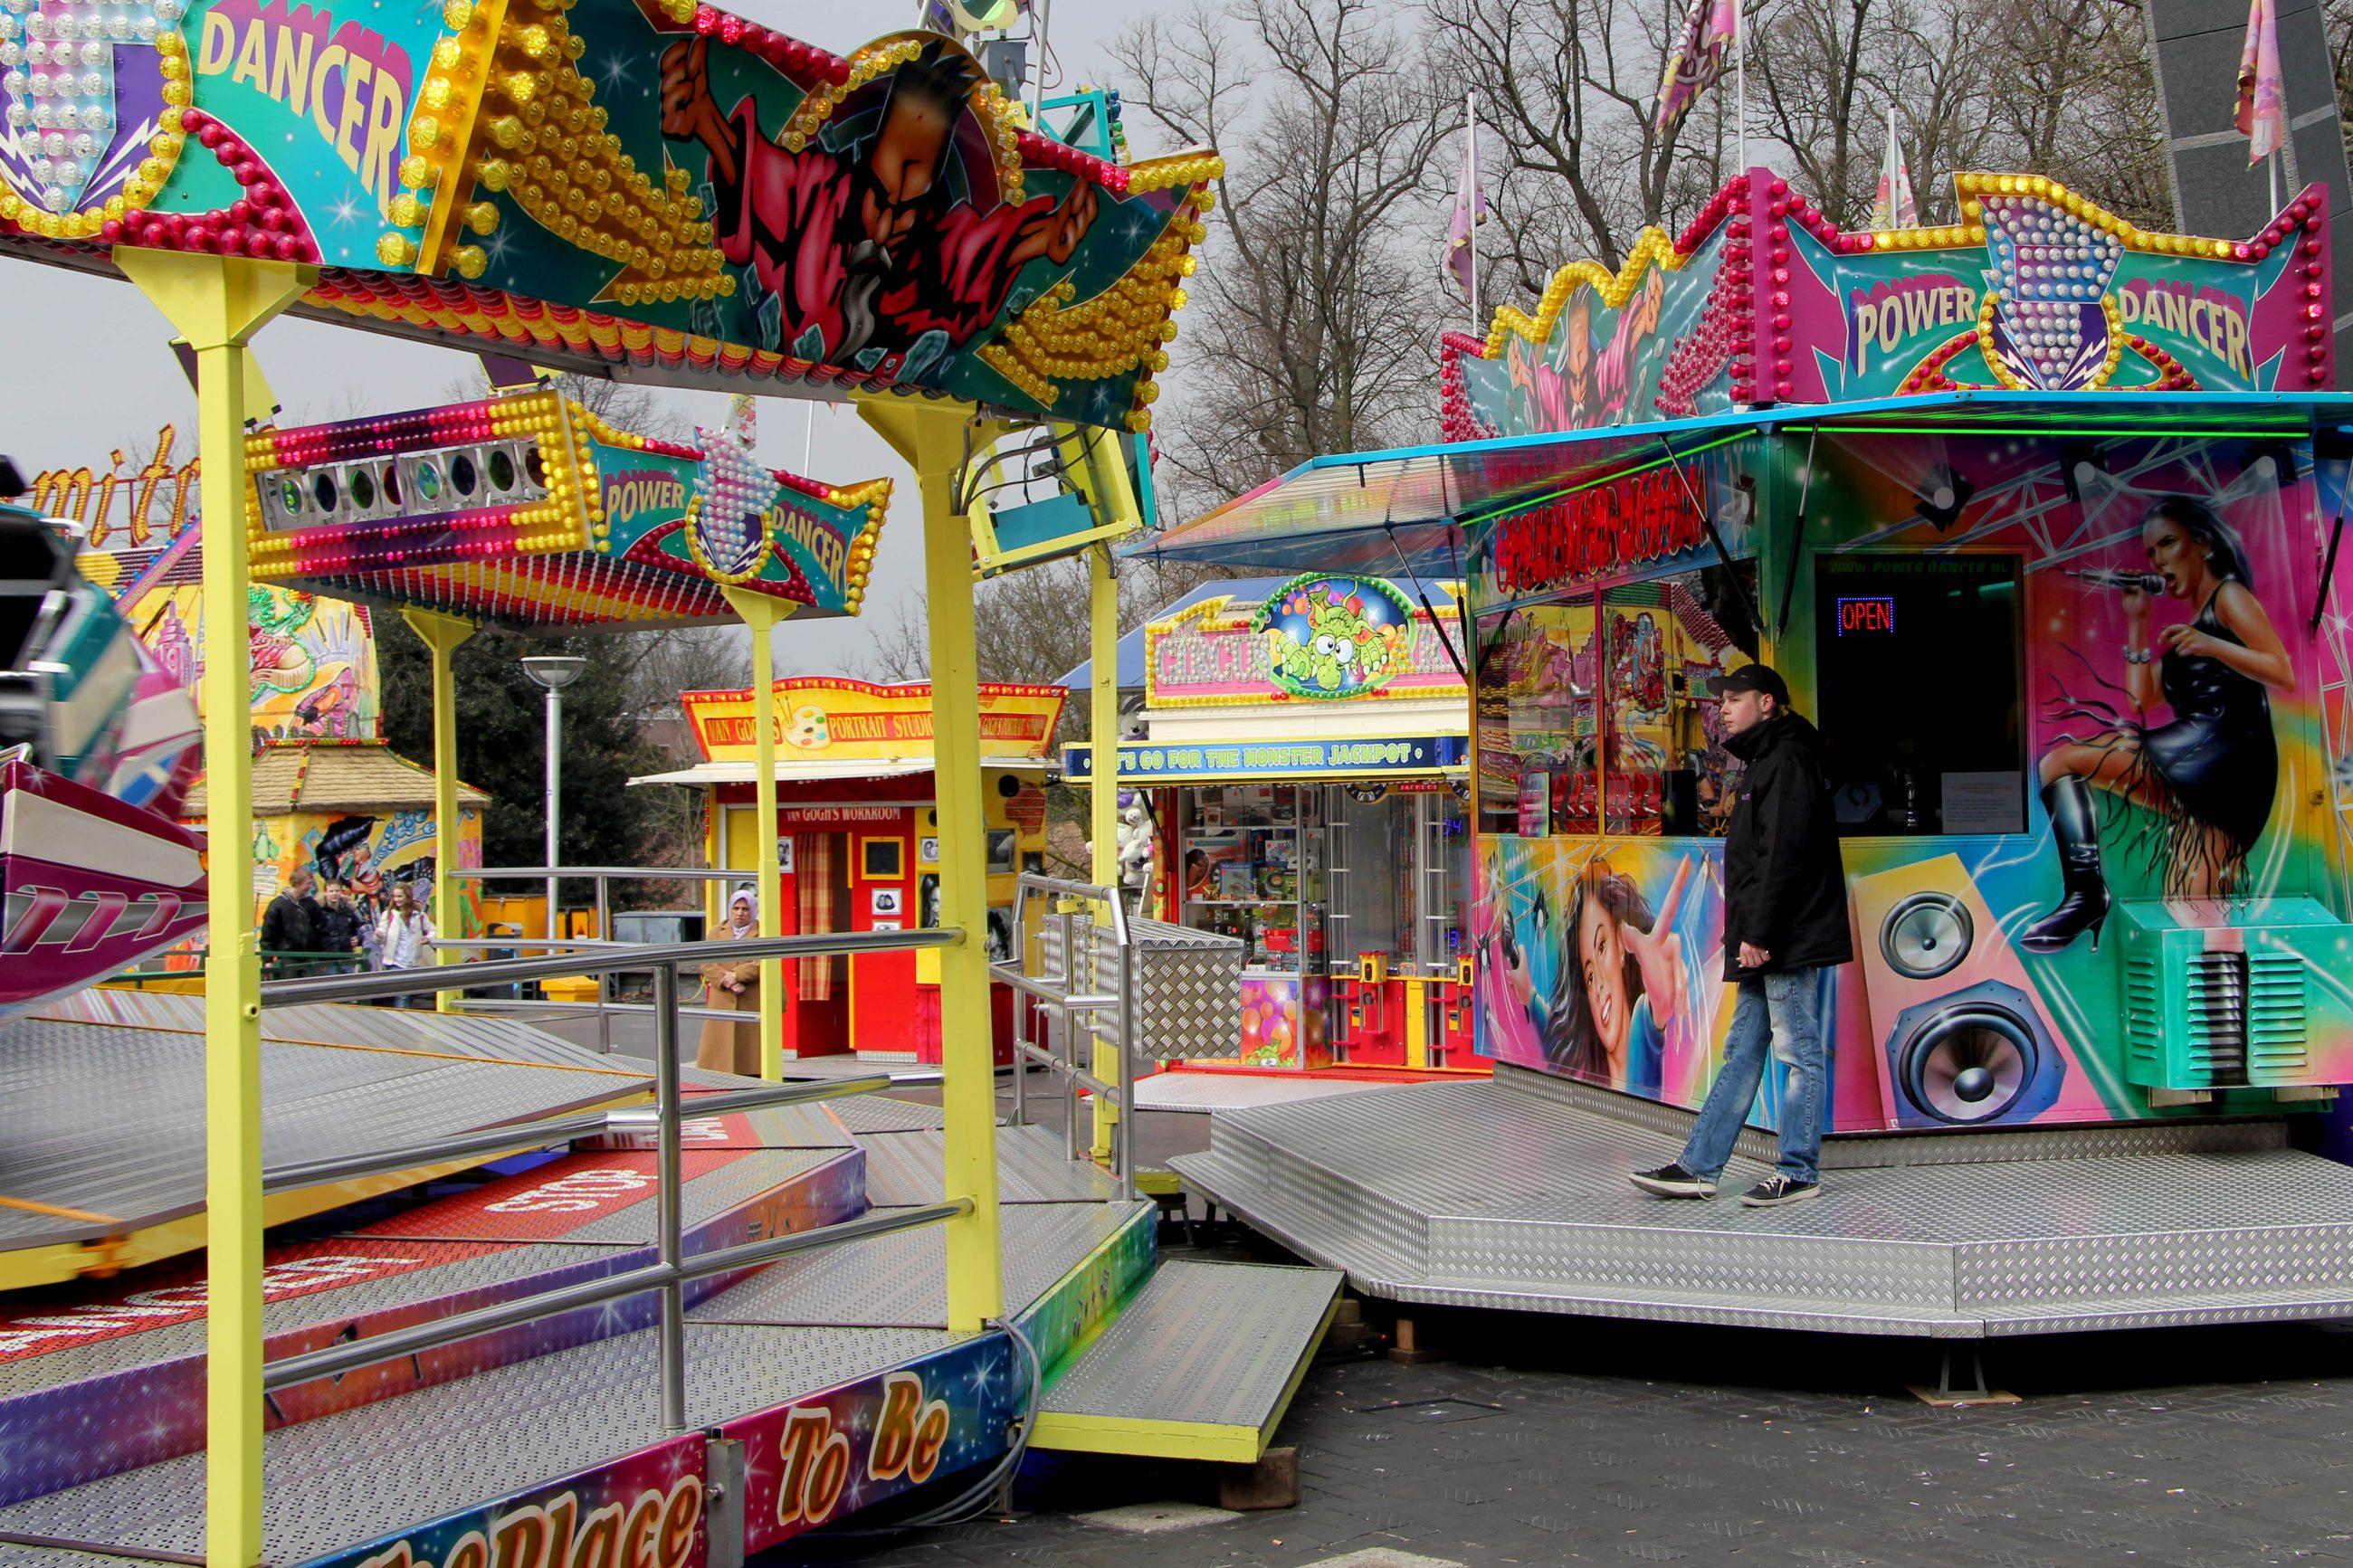 Najaarskermis 2020 (26 september t/m 11 oktober) in Nijmegen